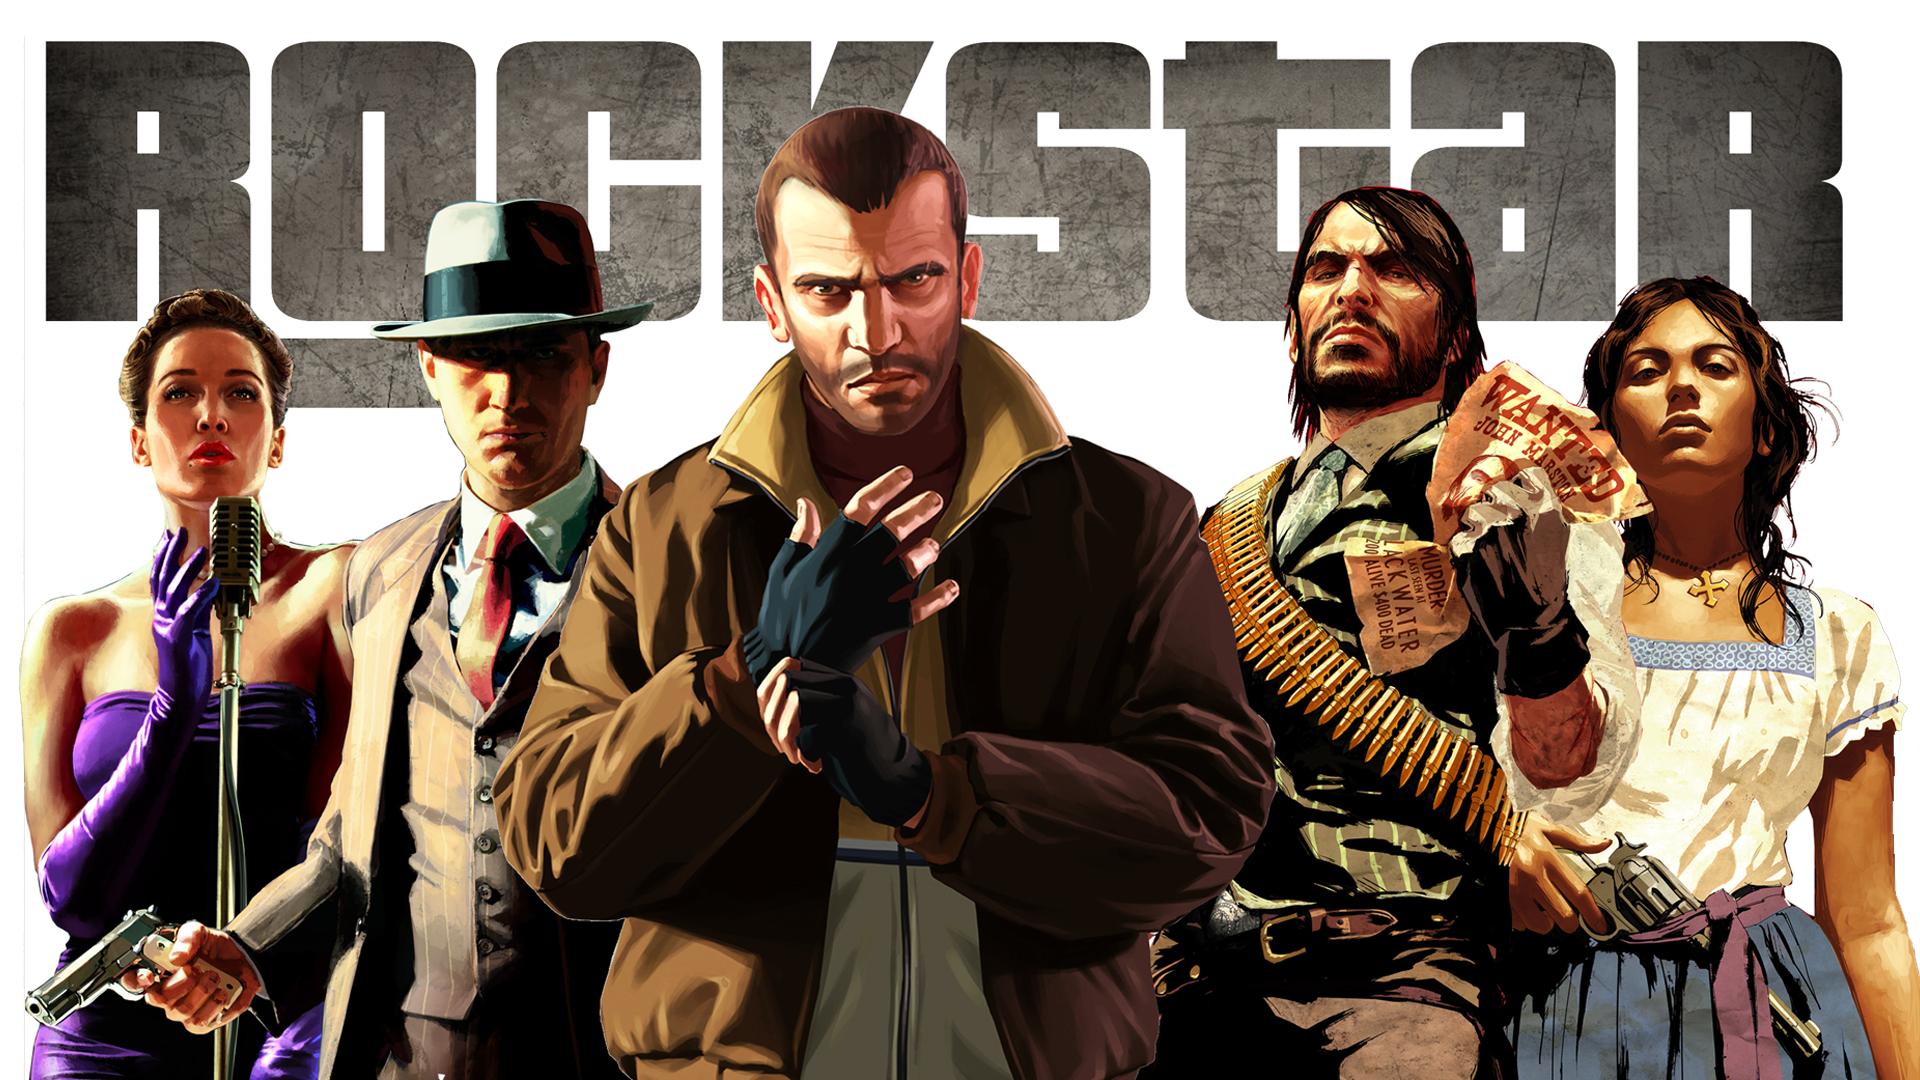 General 1920x1080 Grand Theft Auto IV L.A. Noire Niko Bellic Red Dead Redemption video games John Marston Rockstar Games video game man video game girls